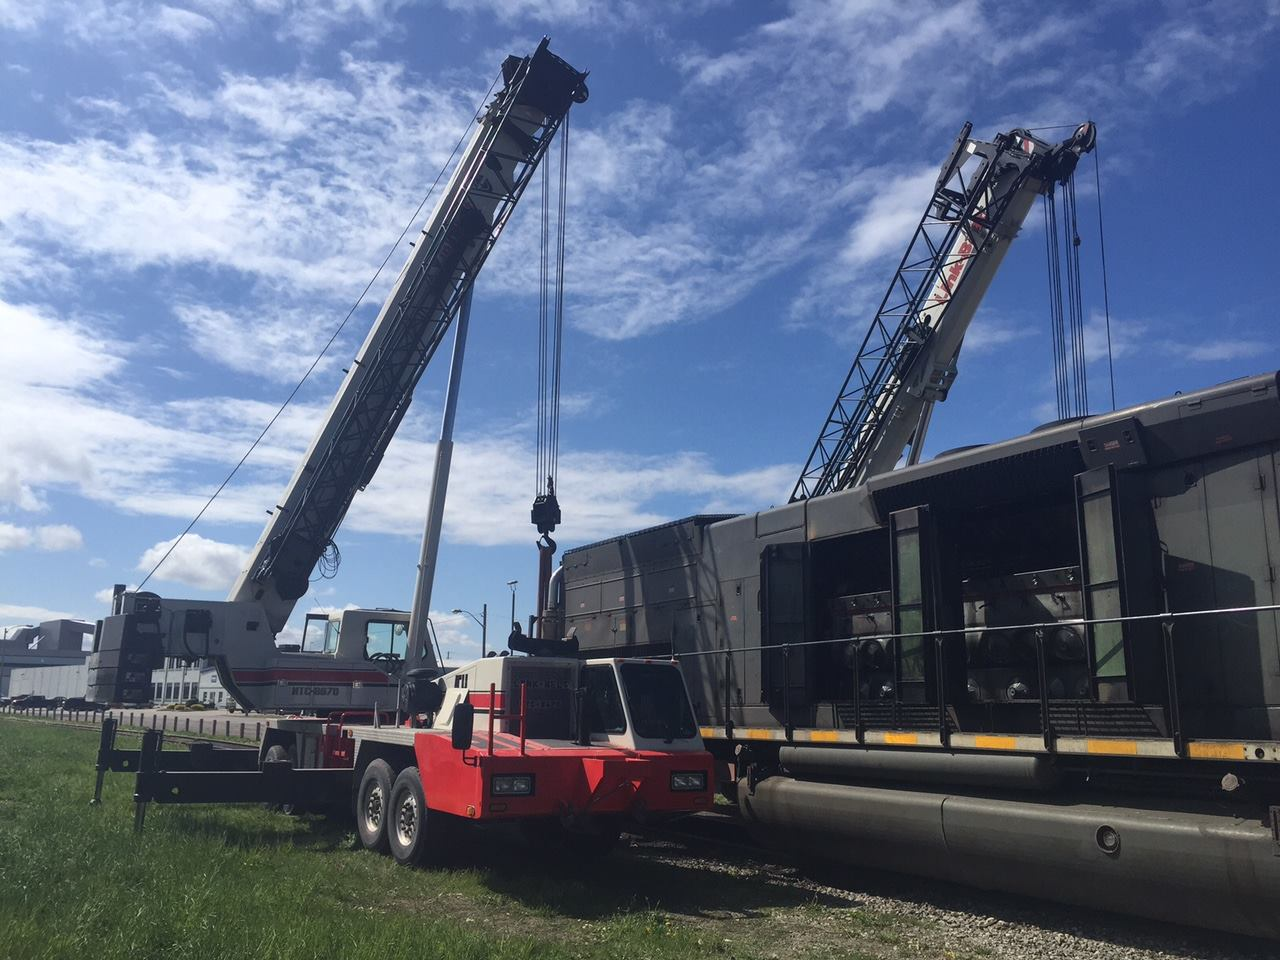 2 cranes lift train car for a motor change